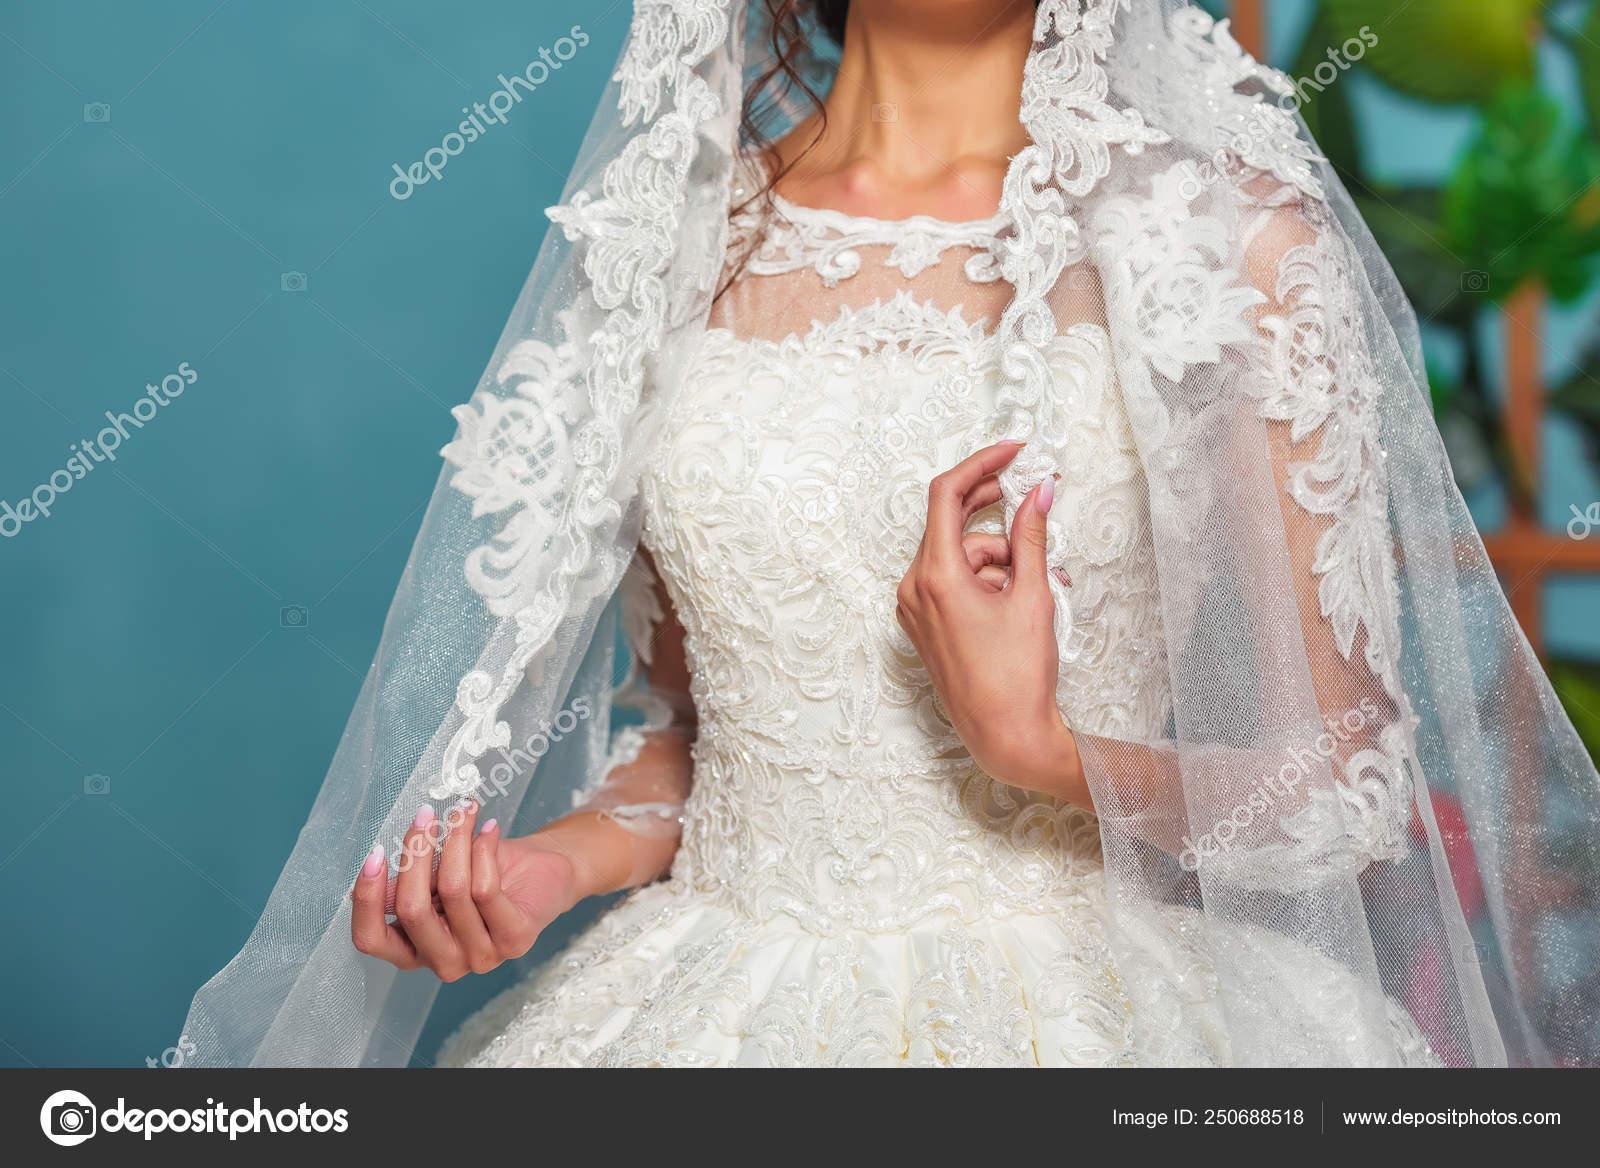 Vestido Novia Nacional Kazajo Manos Chica Tela Encaje